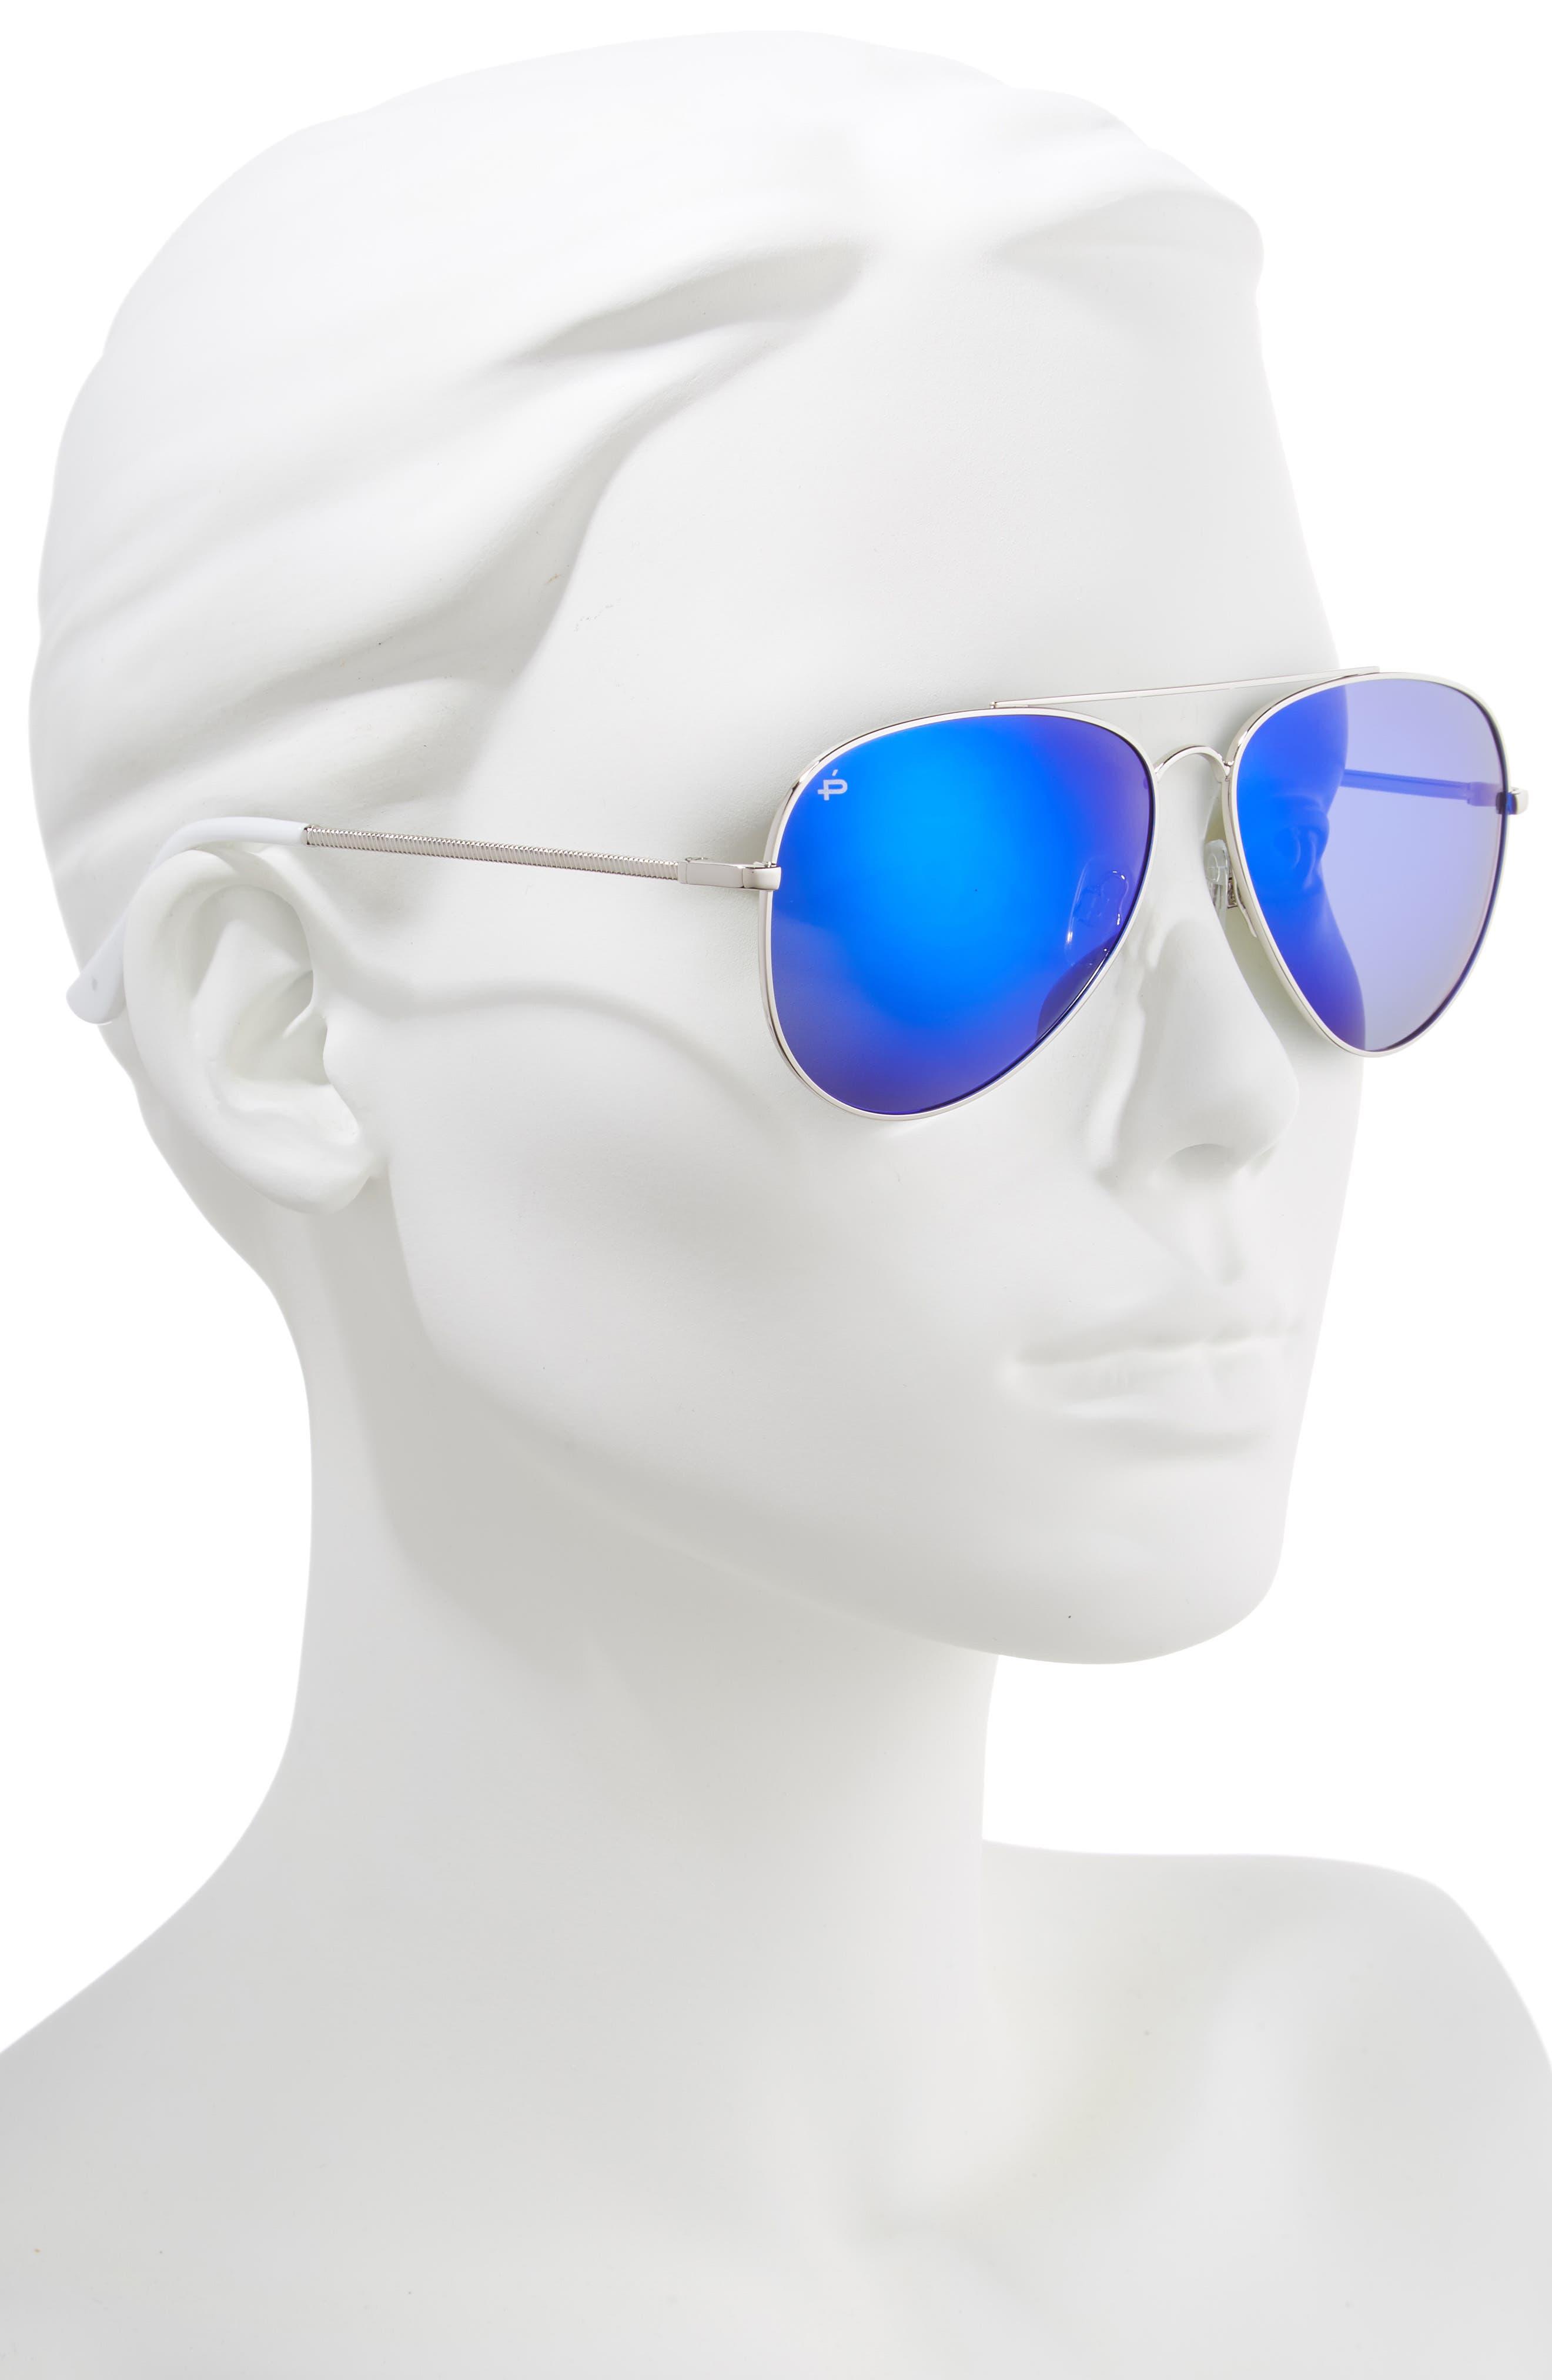 Privé Revaux The Cali Polarized 59mm Sunglasses,                             Alternate thumbnail 2, color,                             NICKEL SILVER